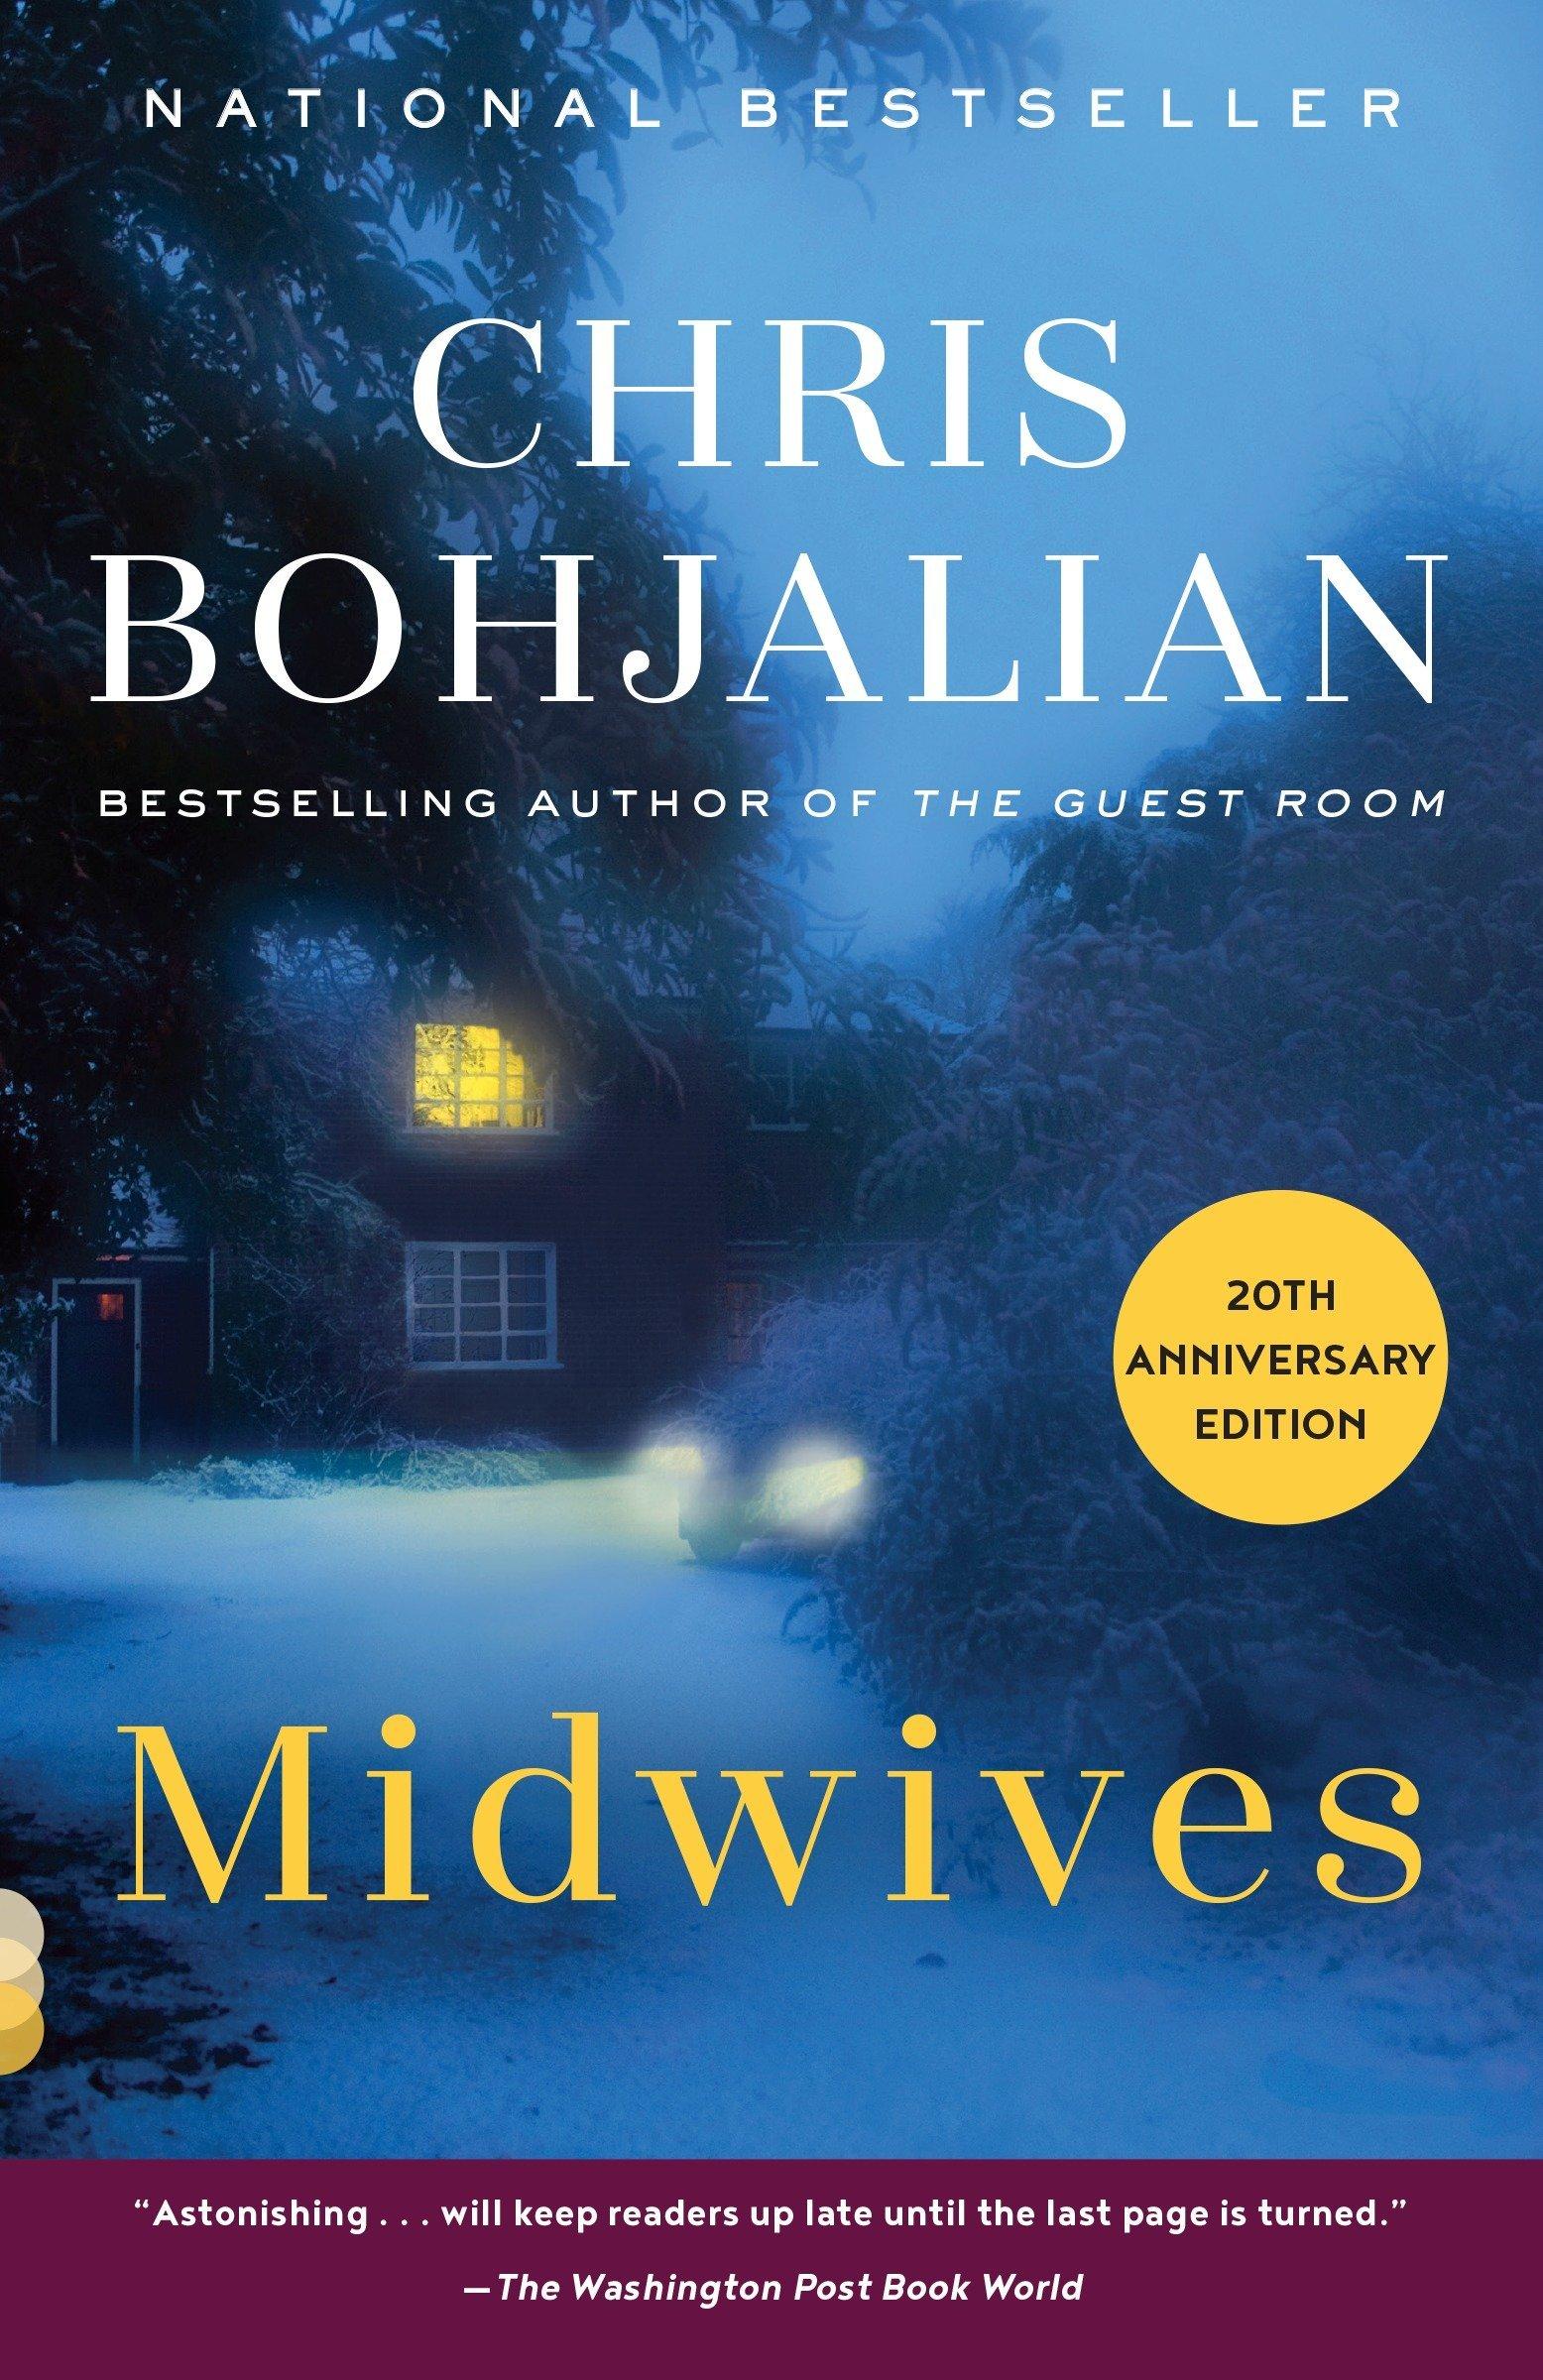 Midwives Oprahs Book Club Chris Bohjalian 9780375706776 Amazon Books